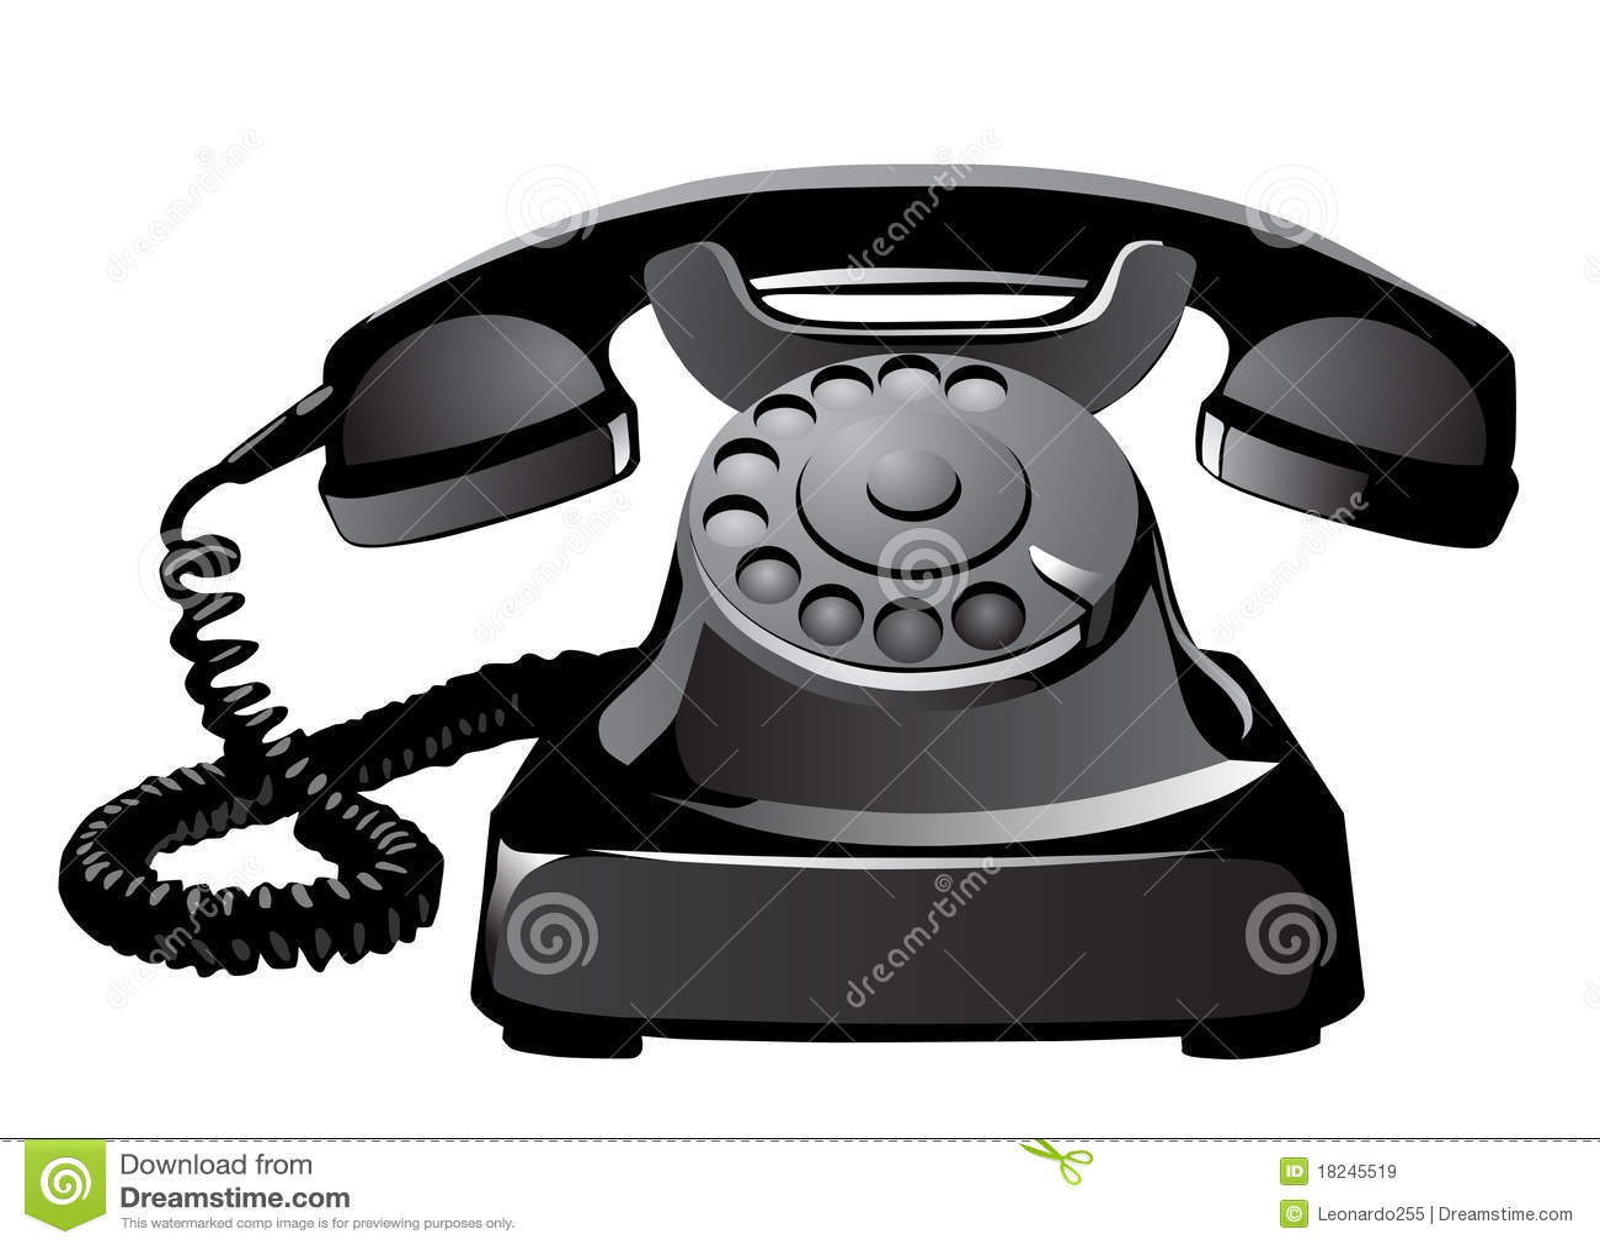 clip art antique phone - photo #14